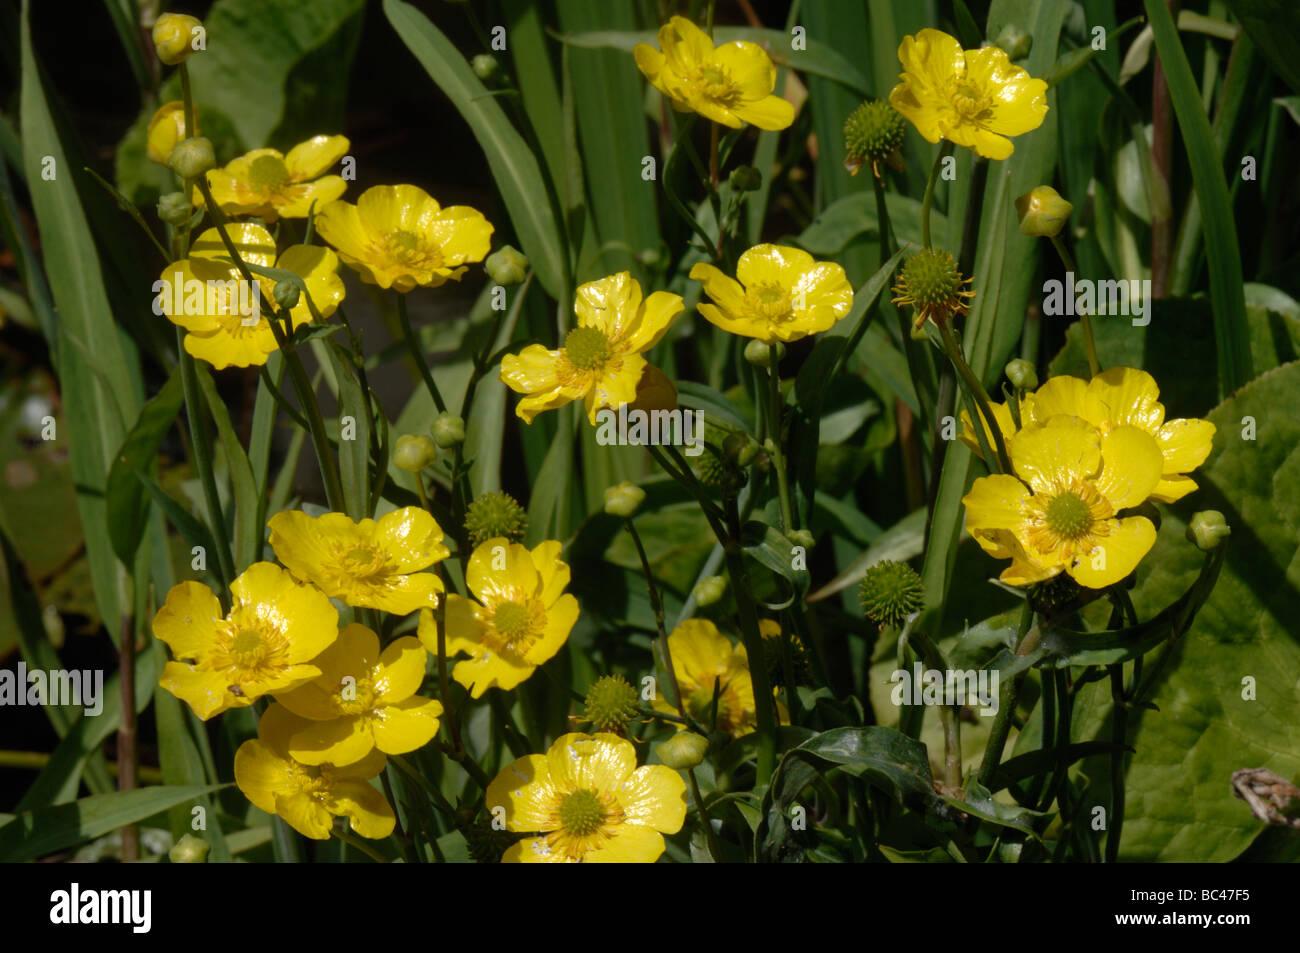 Greater spearwort Ranunculus lingua Grandiflora flowering in a garden pond - Stock Image